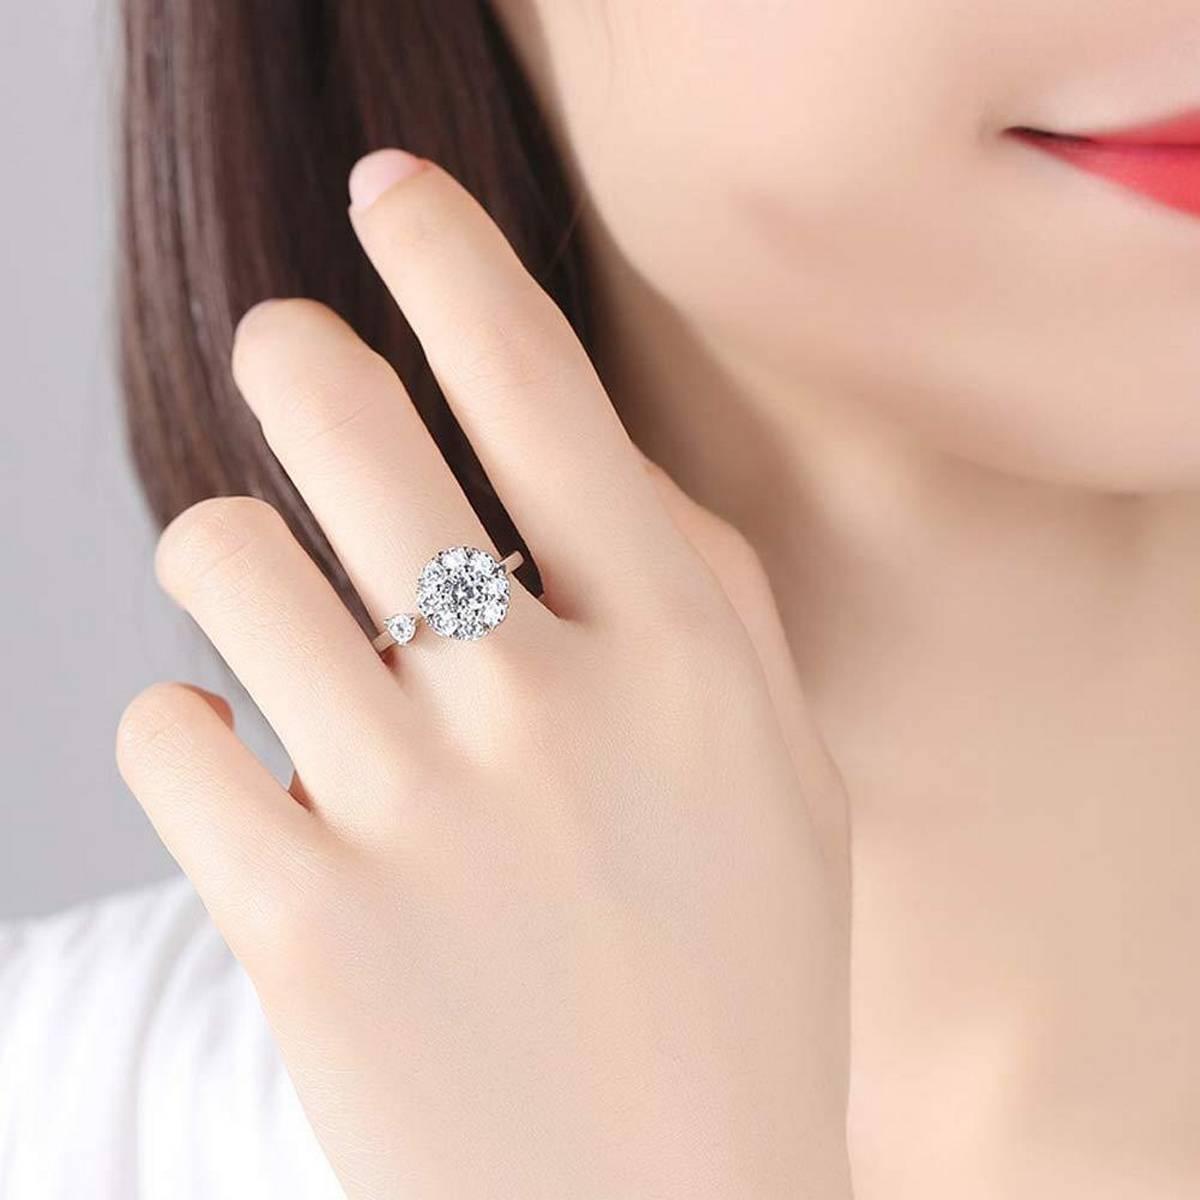 Big Diamond Crystal Rhinestone Ladies Wedding Finger Ring Women Engagement Decoration Girl Sliver Pink